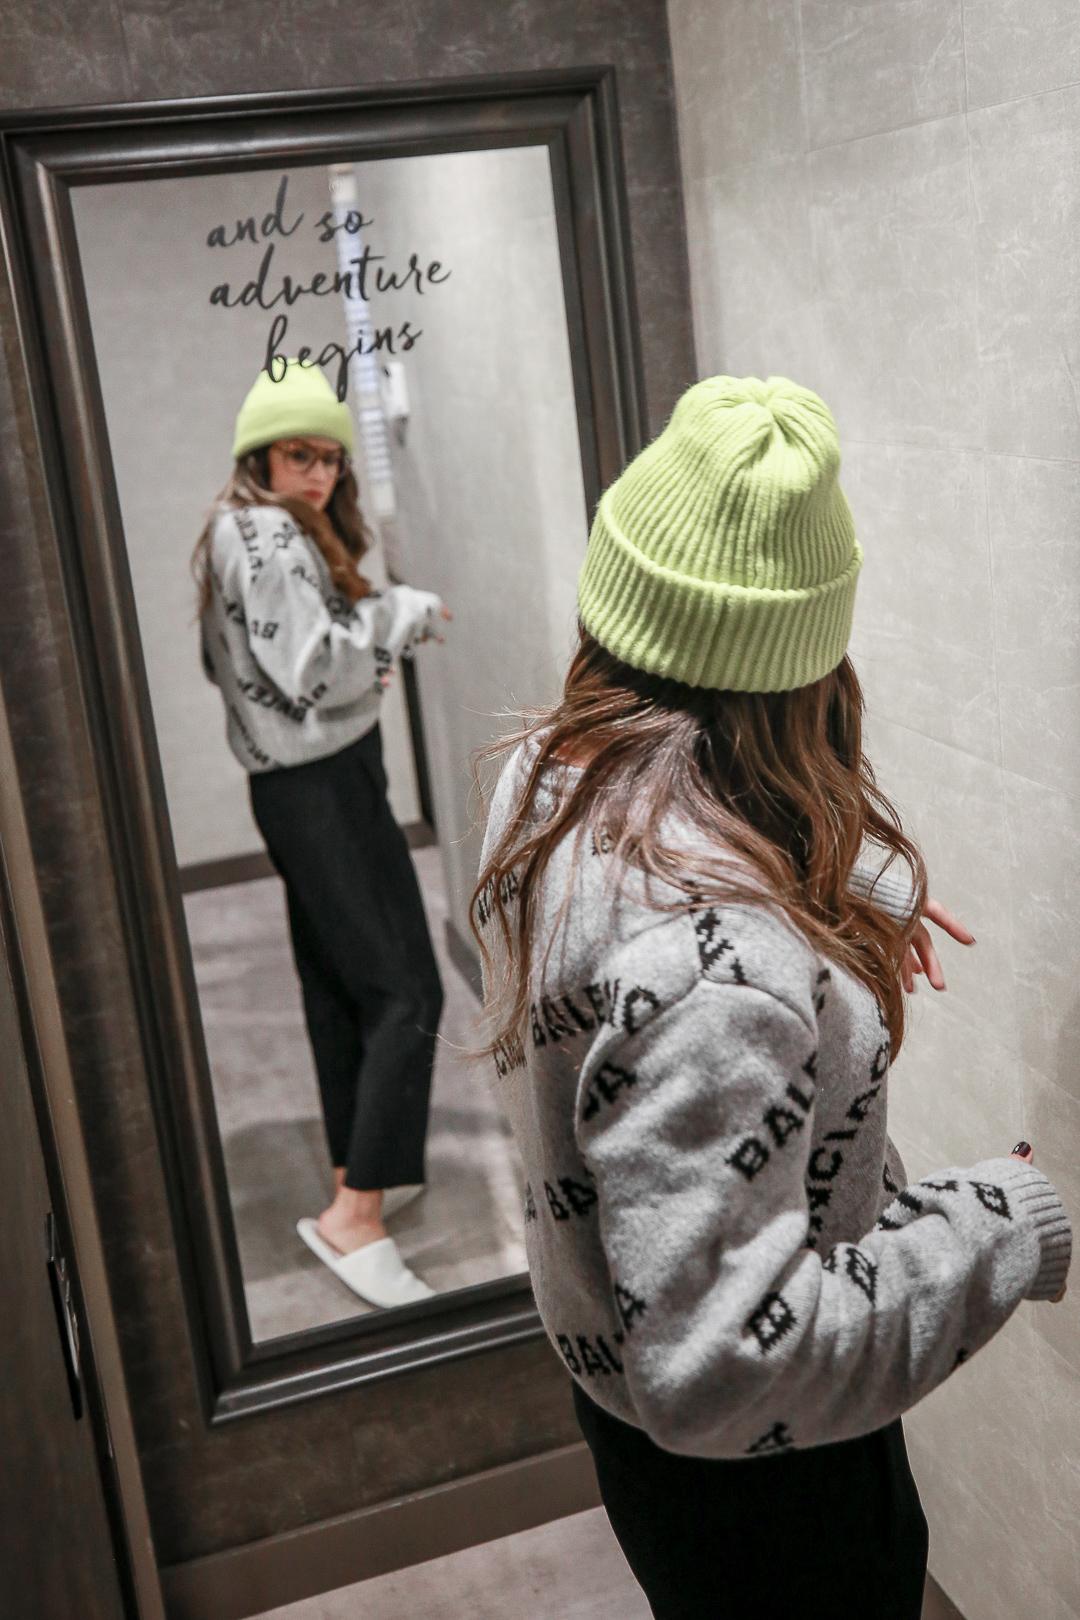 Nathalie Martin wearing Balenciaga logo sweater, Saint Laurent canvas sneakers, and neon green beanie and Bonlook Jerry glasses, streetstyle, woahstyle.com_3830.jpg